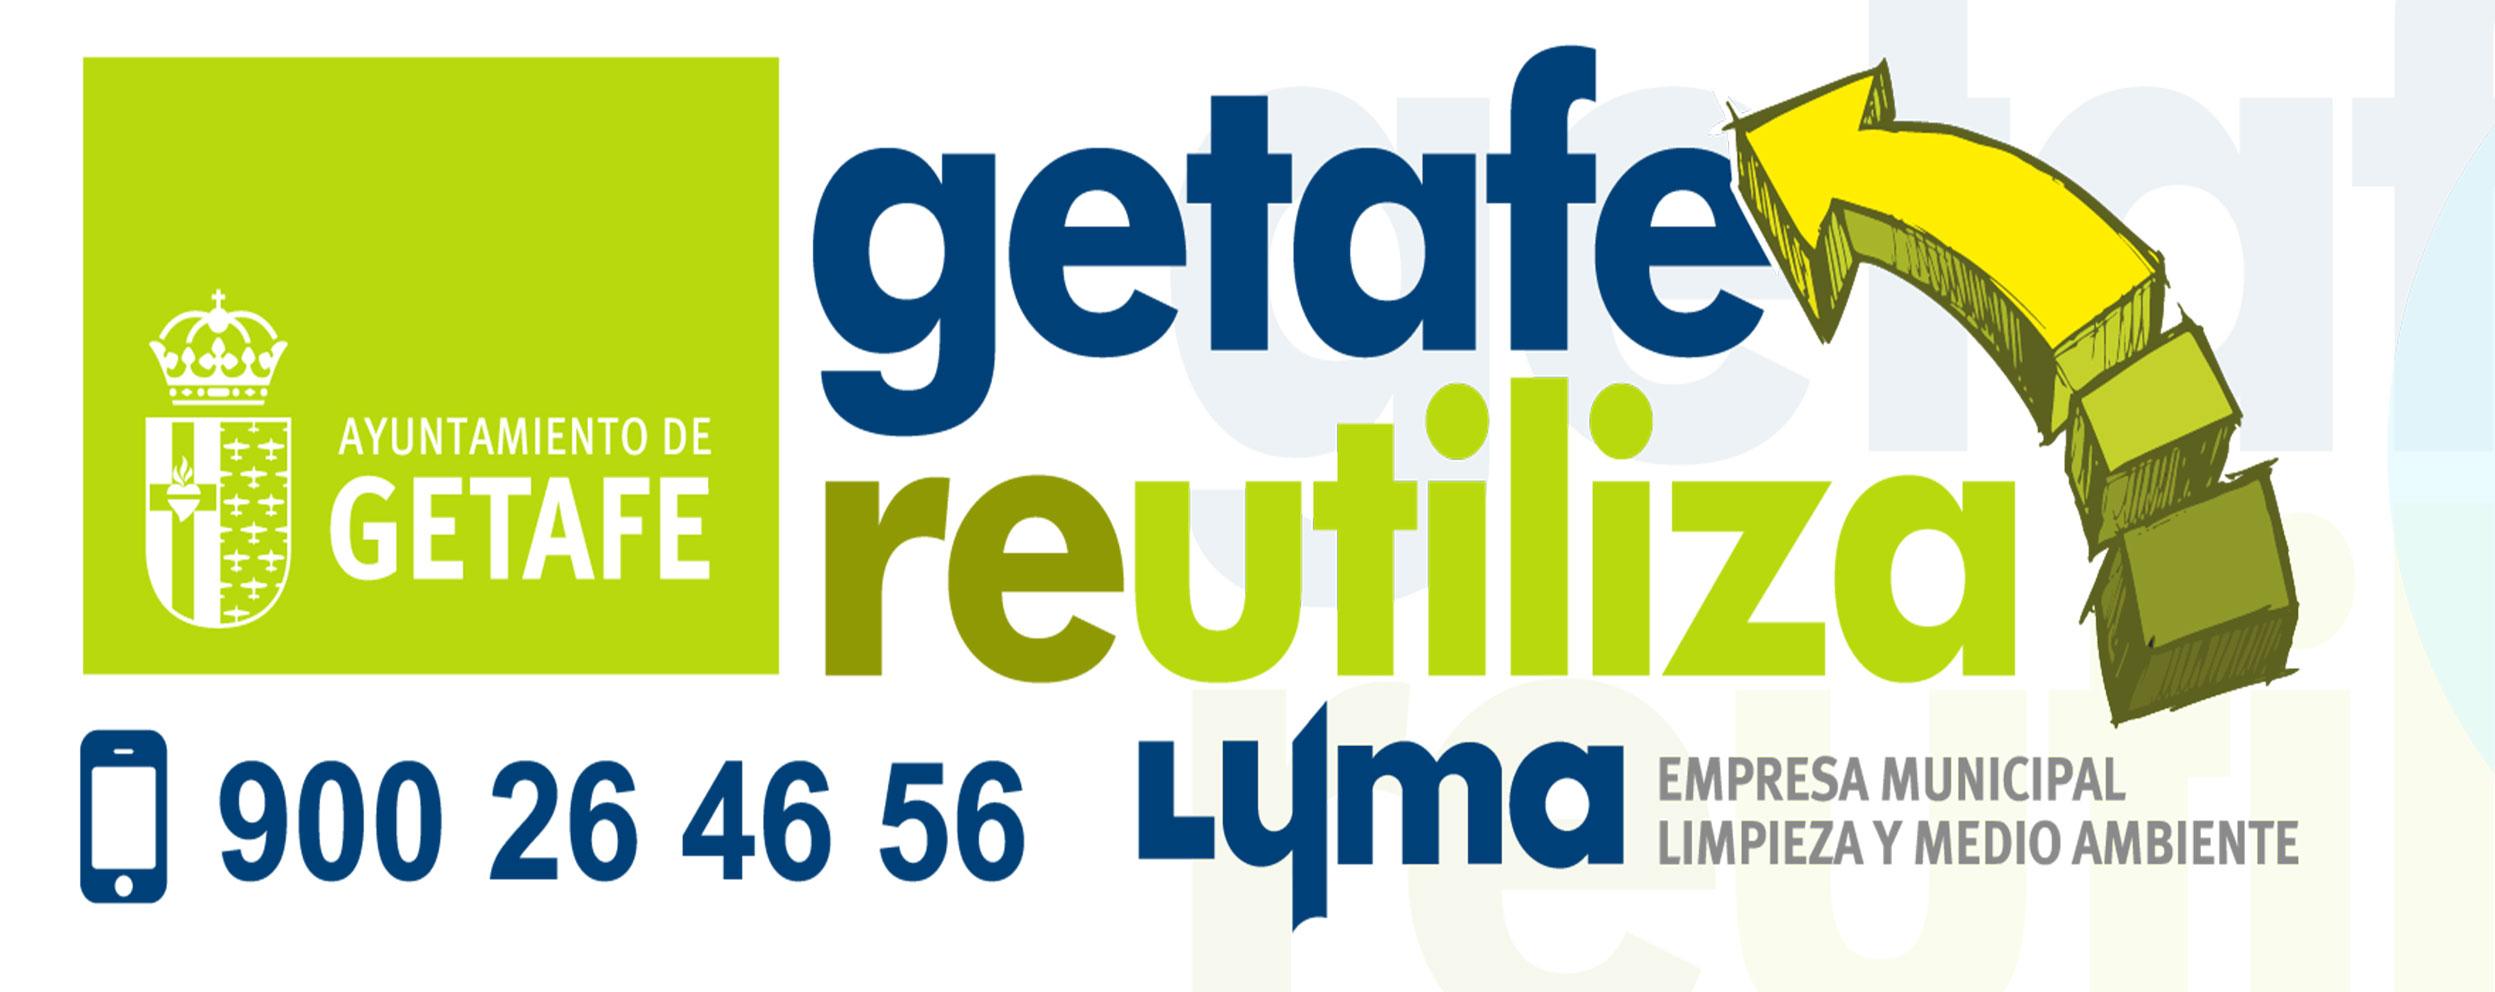 Getafe Reutiliza